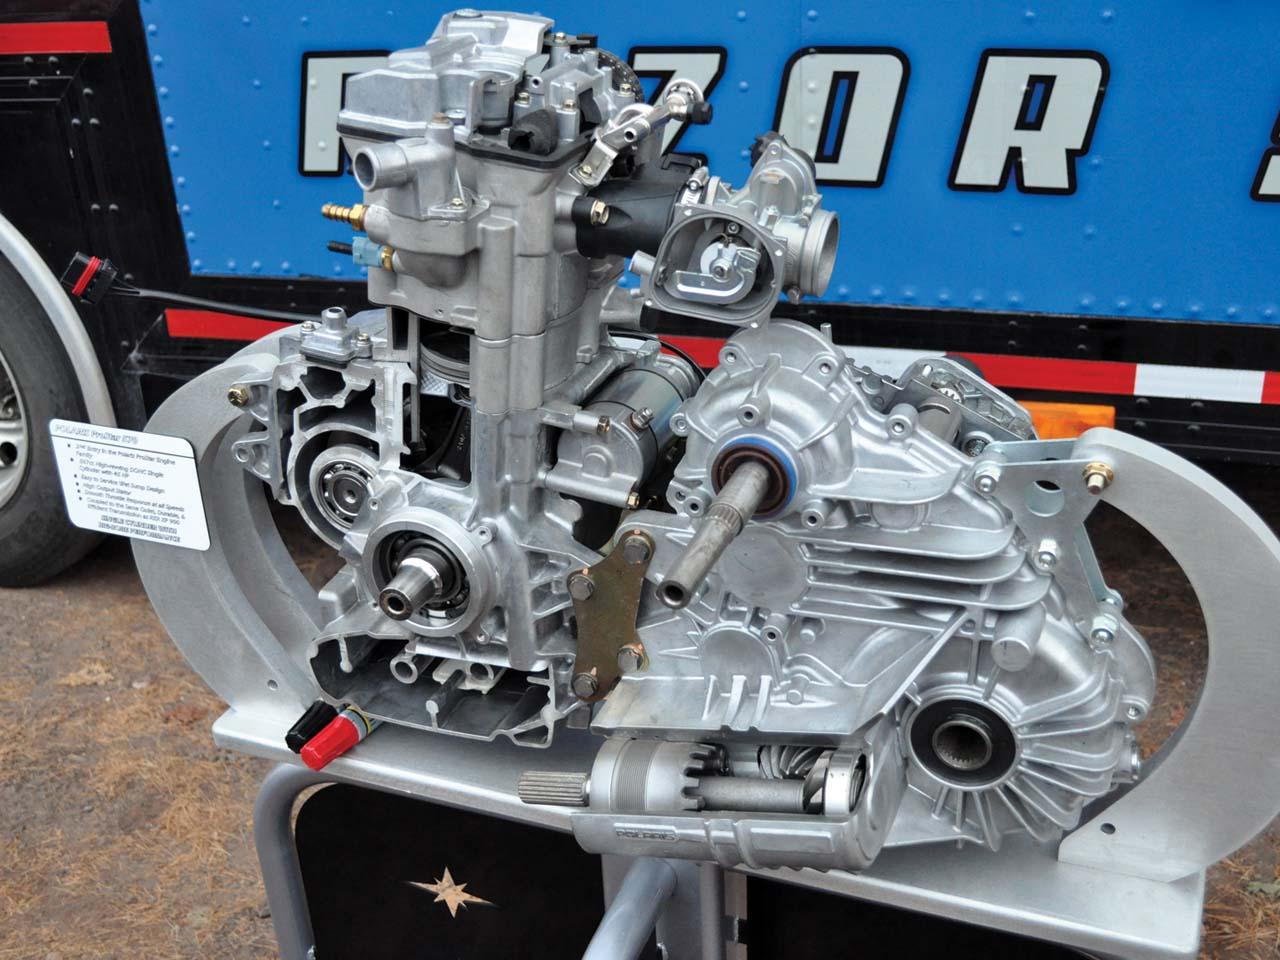 Polaris Rzr 800 Dimensions >> First Ride - The All-New Polaris RZR 570 | ATV Illustrated